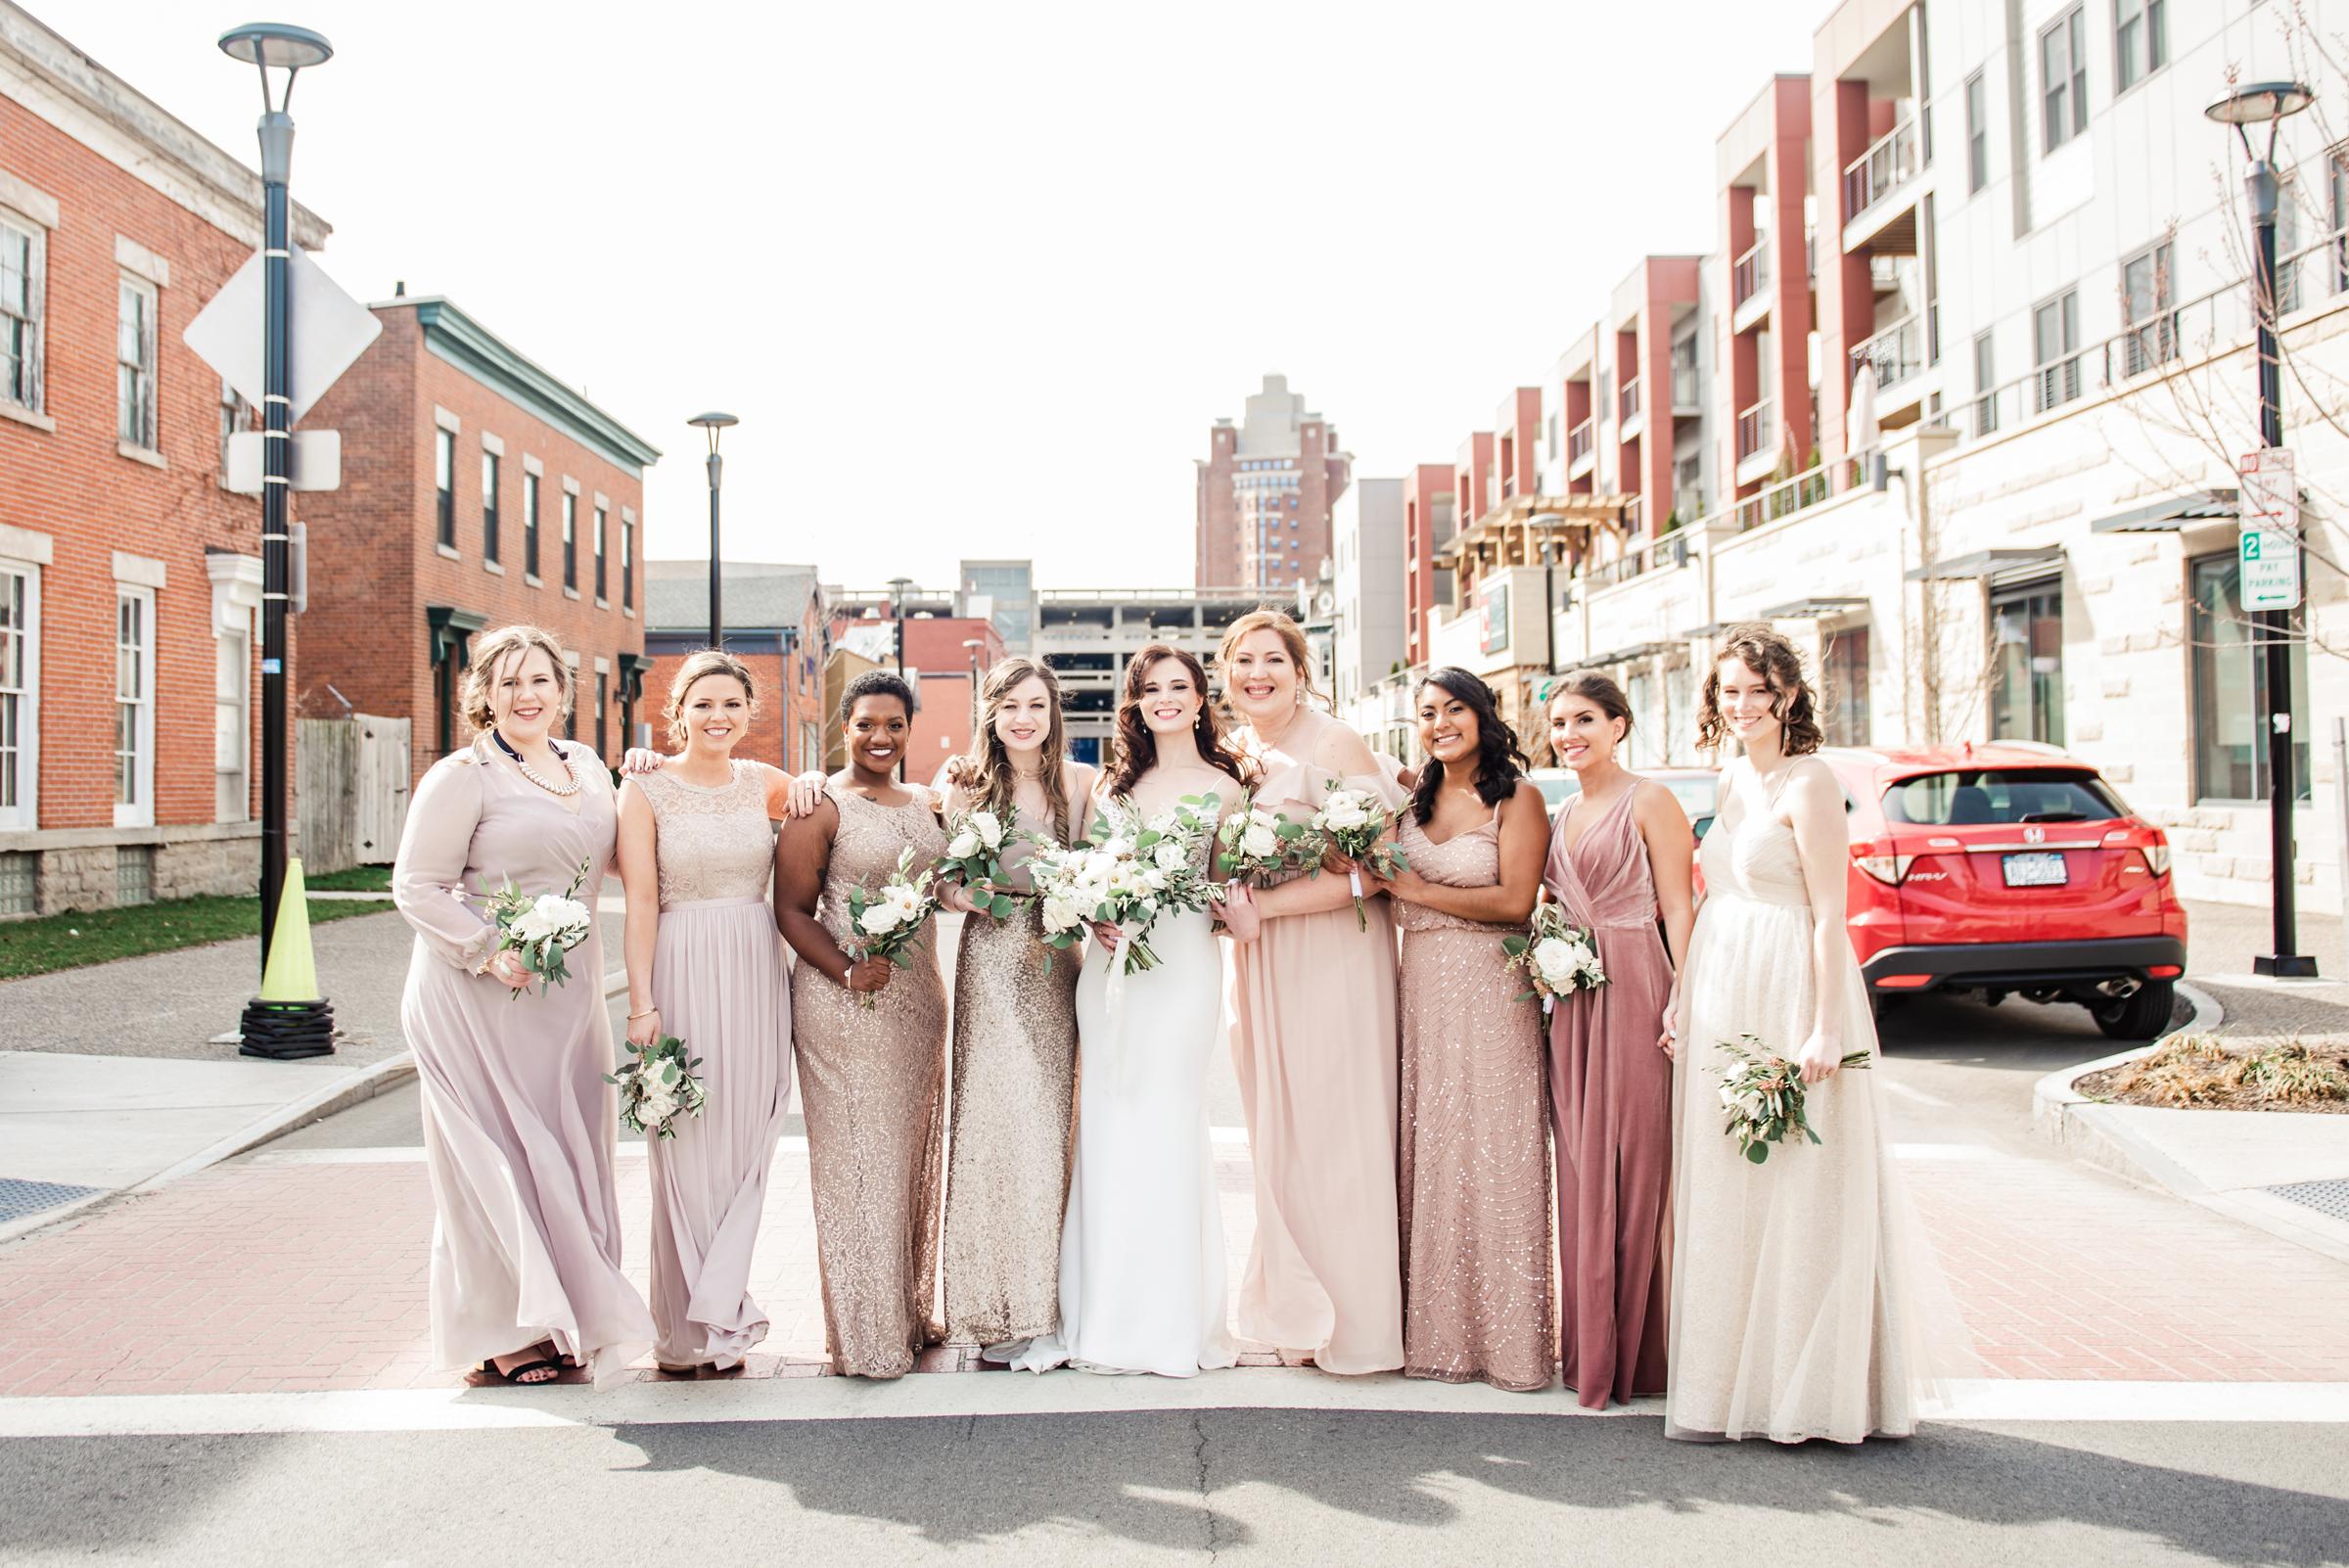 The_Arbor_LoftRochester_Wedding_JILL_STUDIO_Rochester_NY_Photographer_155011.jpg